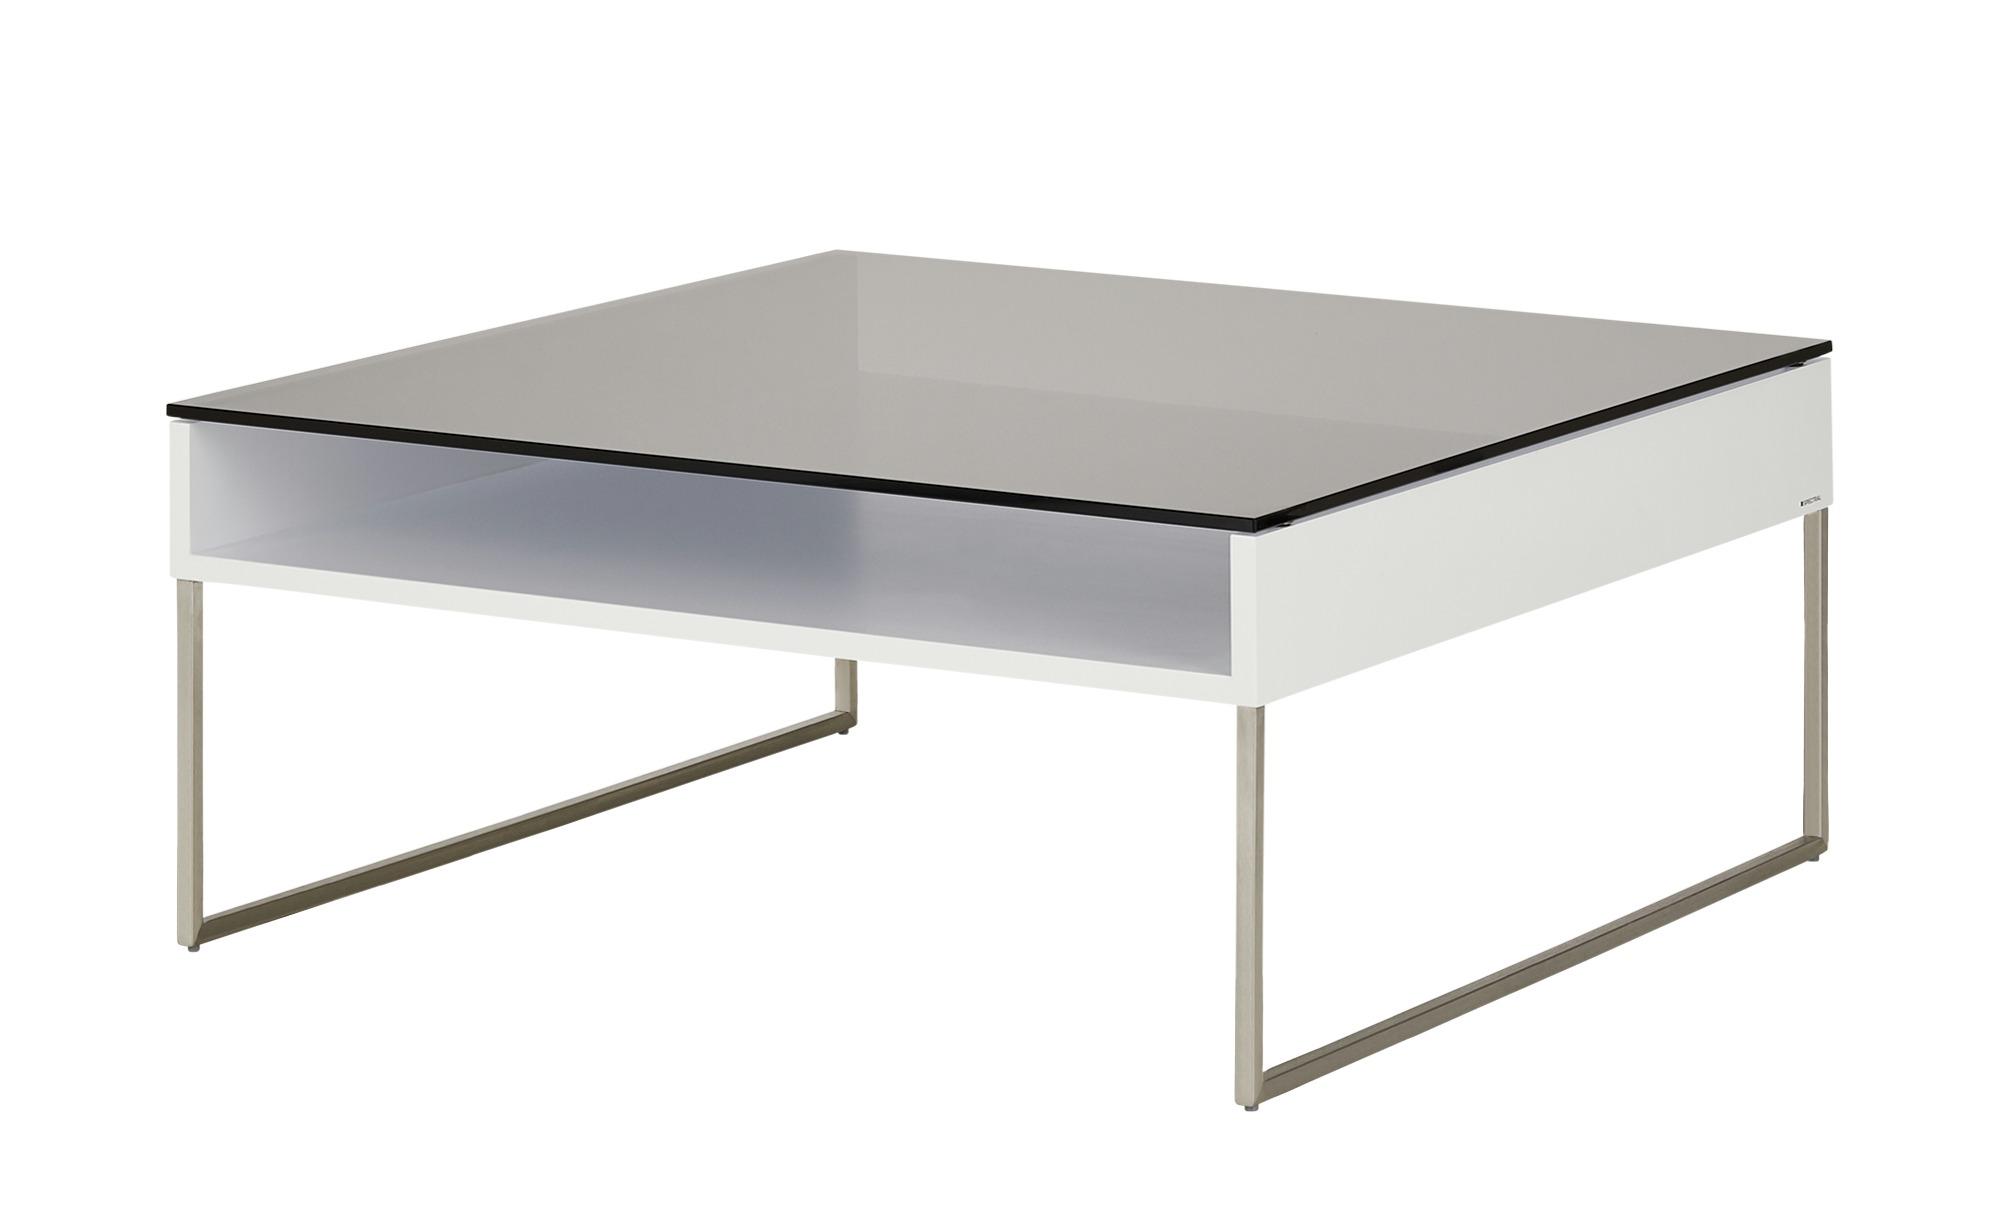 SPECTRAL Couchtisch  Tables